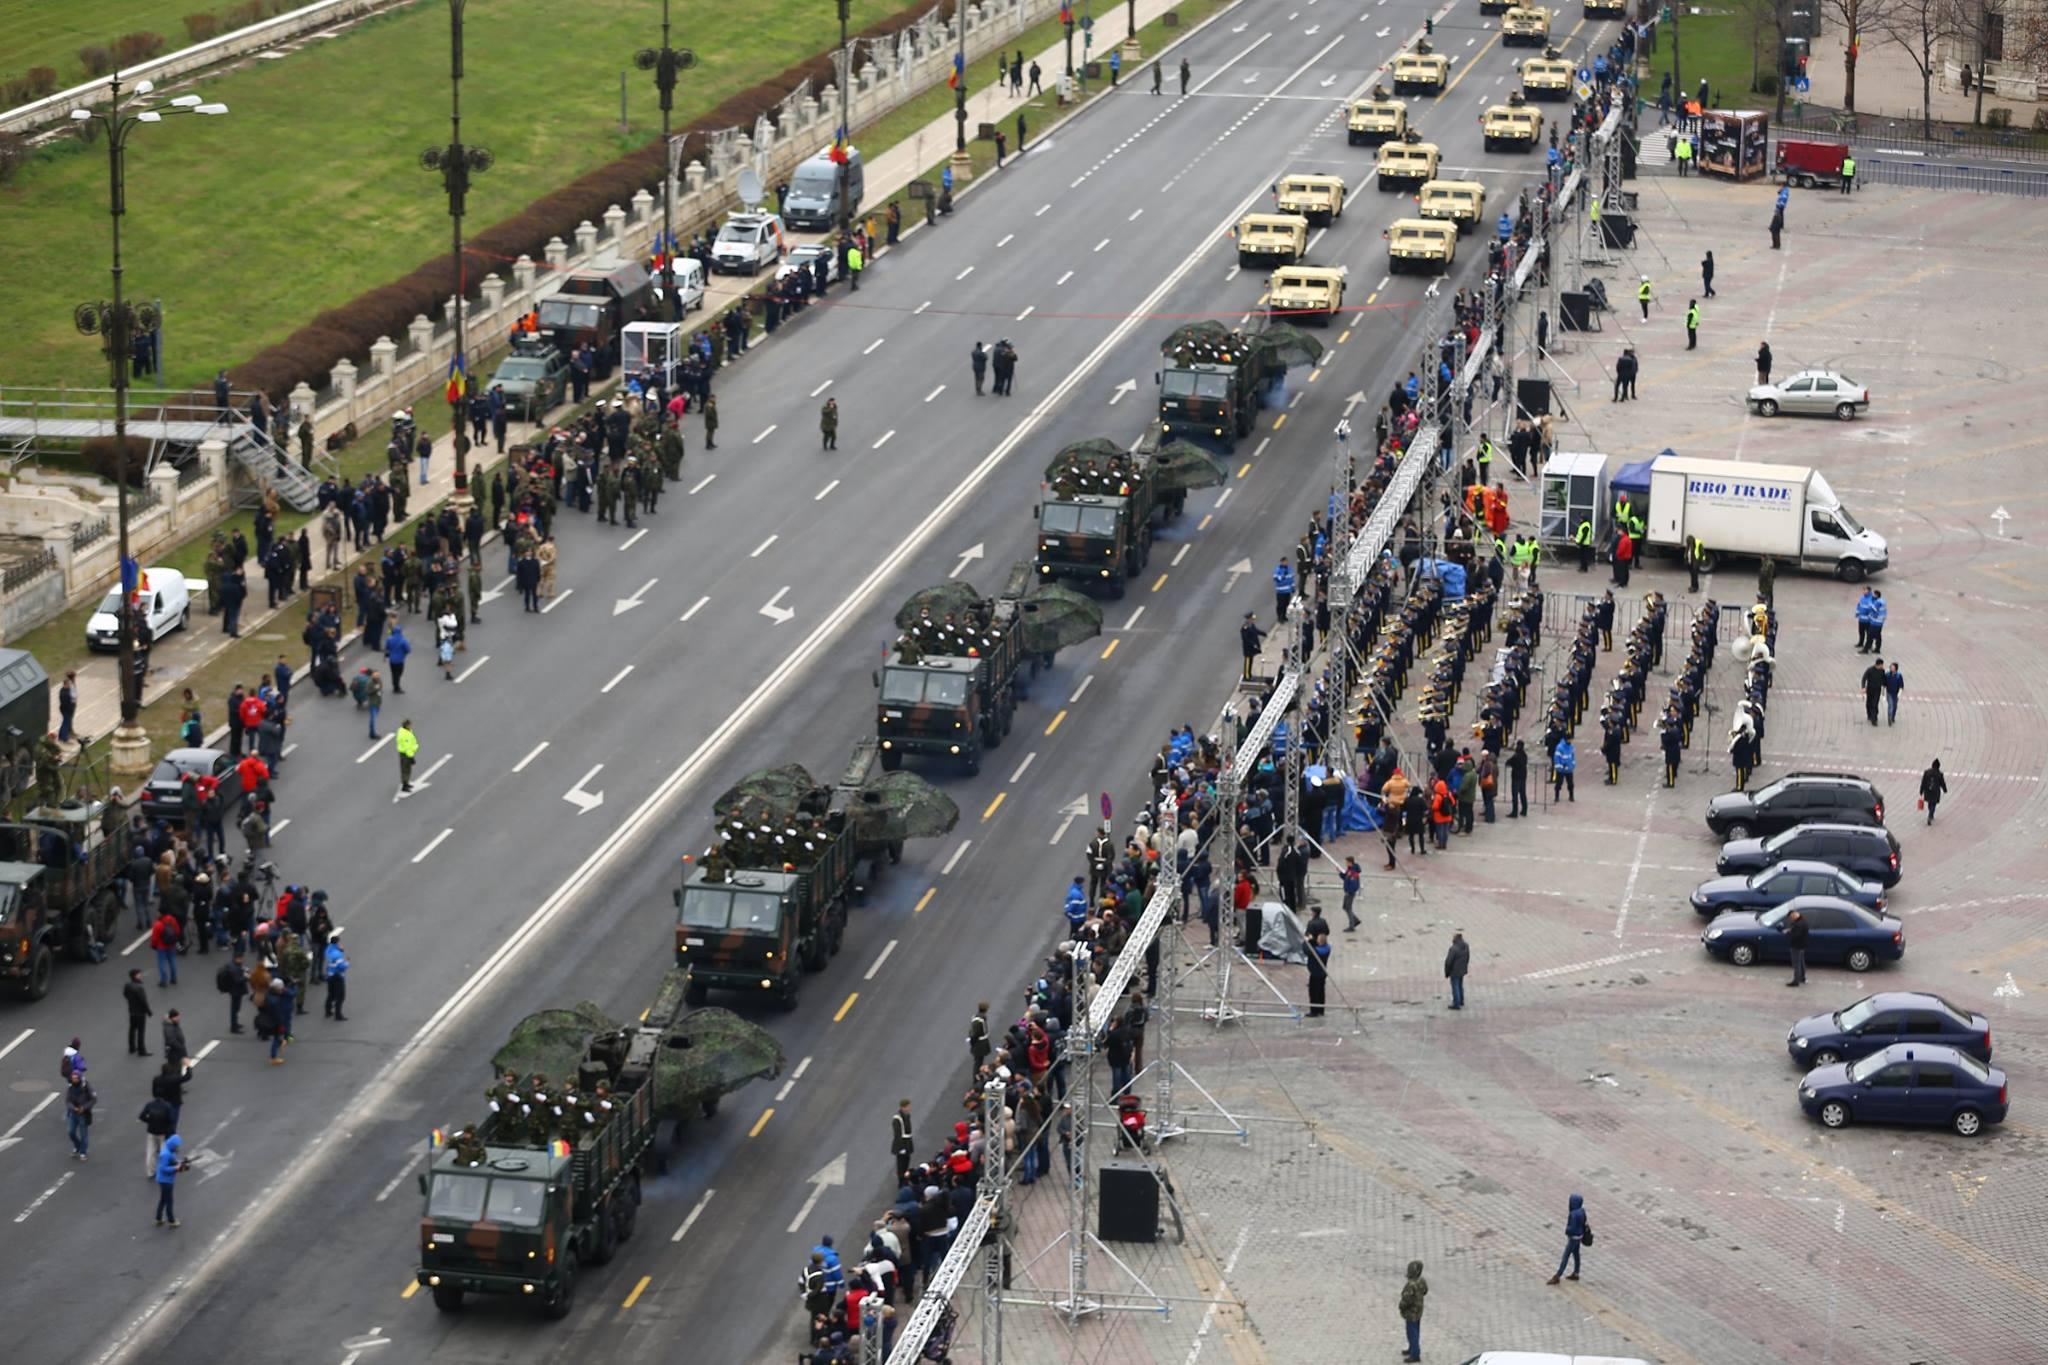 Repetitii parada militara 1 decembrie. Foto - MApN 5